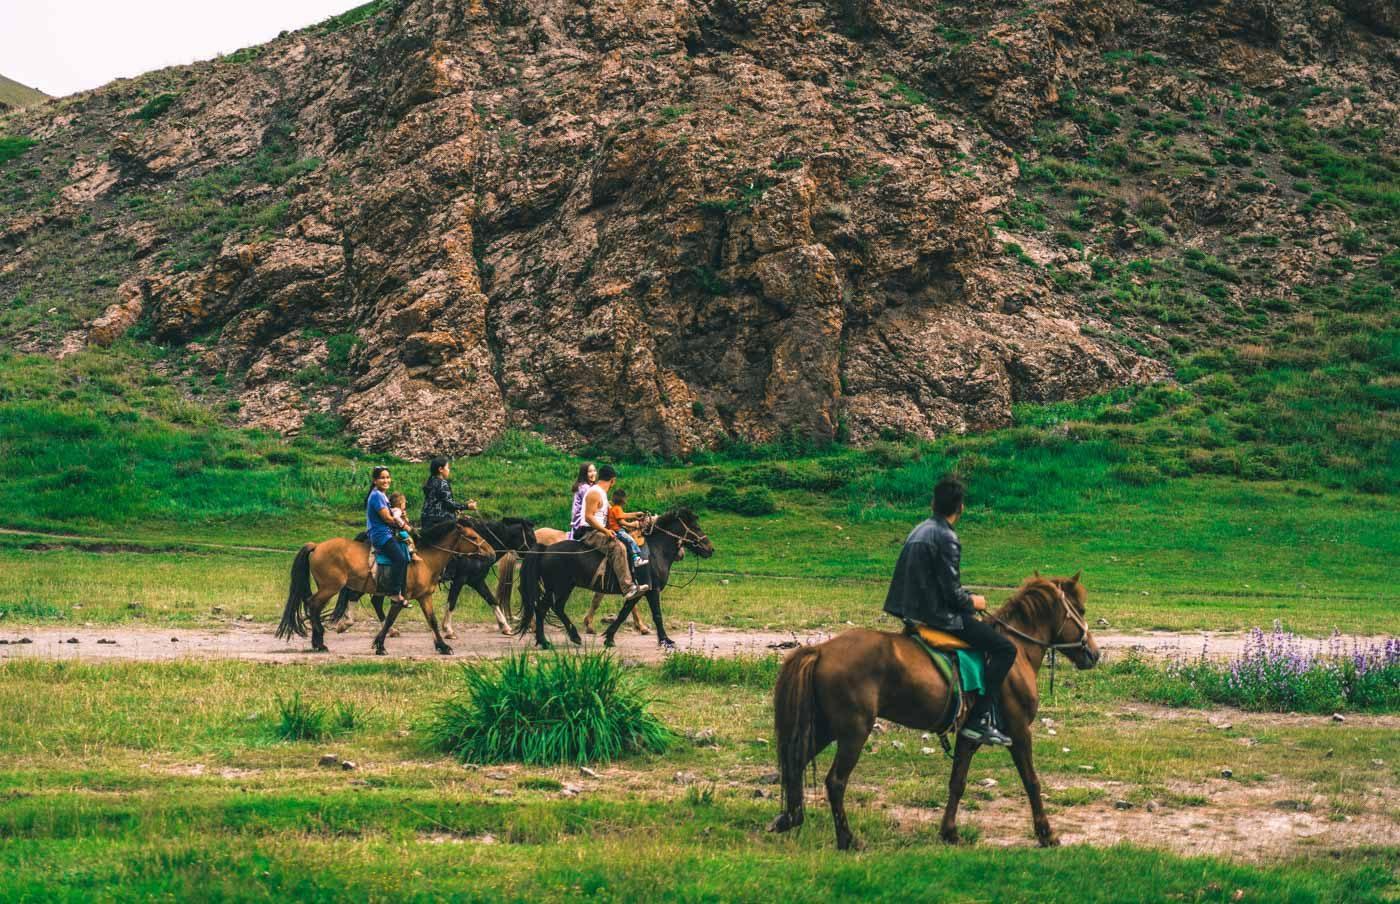 Mongolia Archives - Drink Tea & Travel